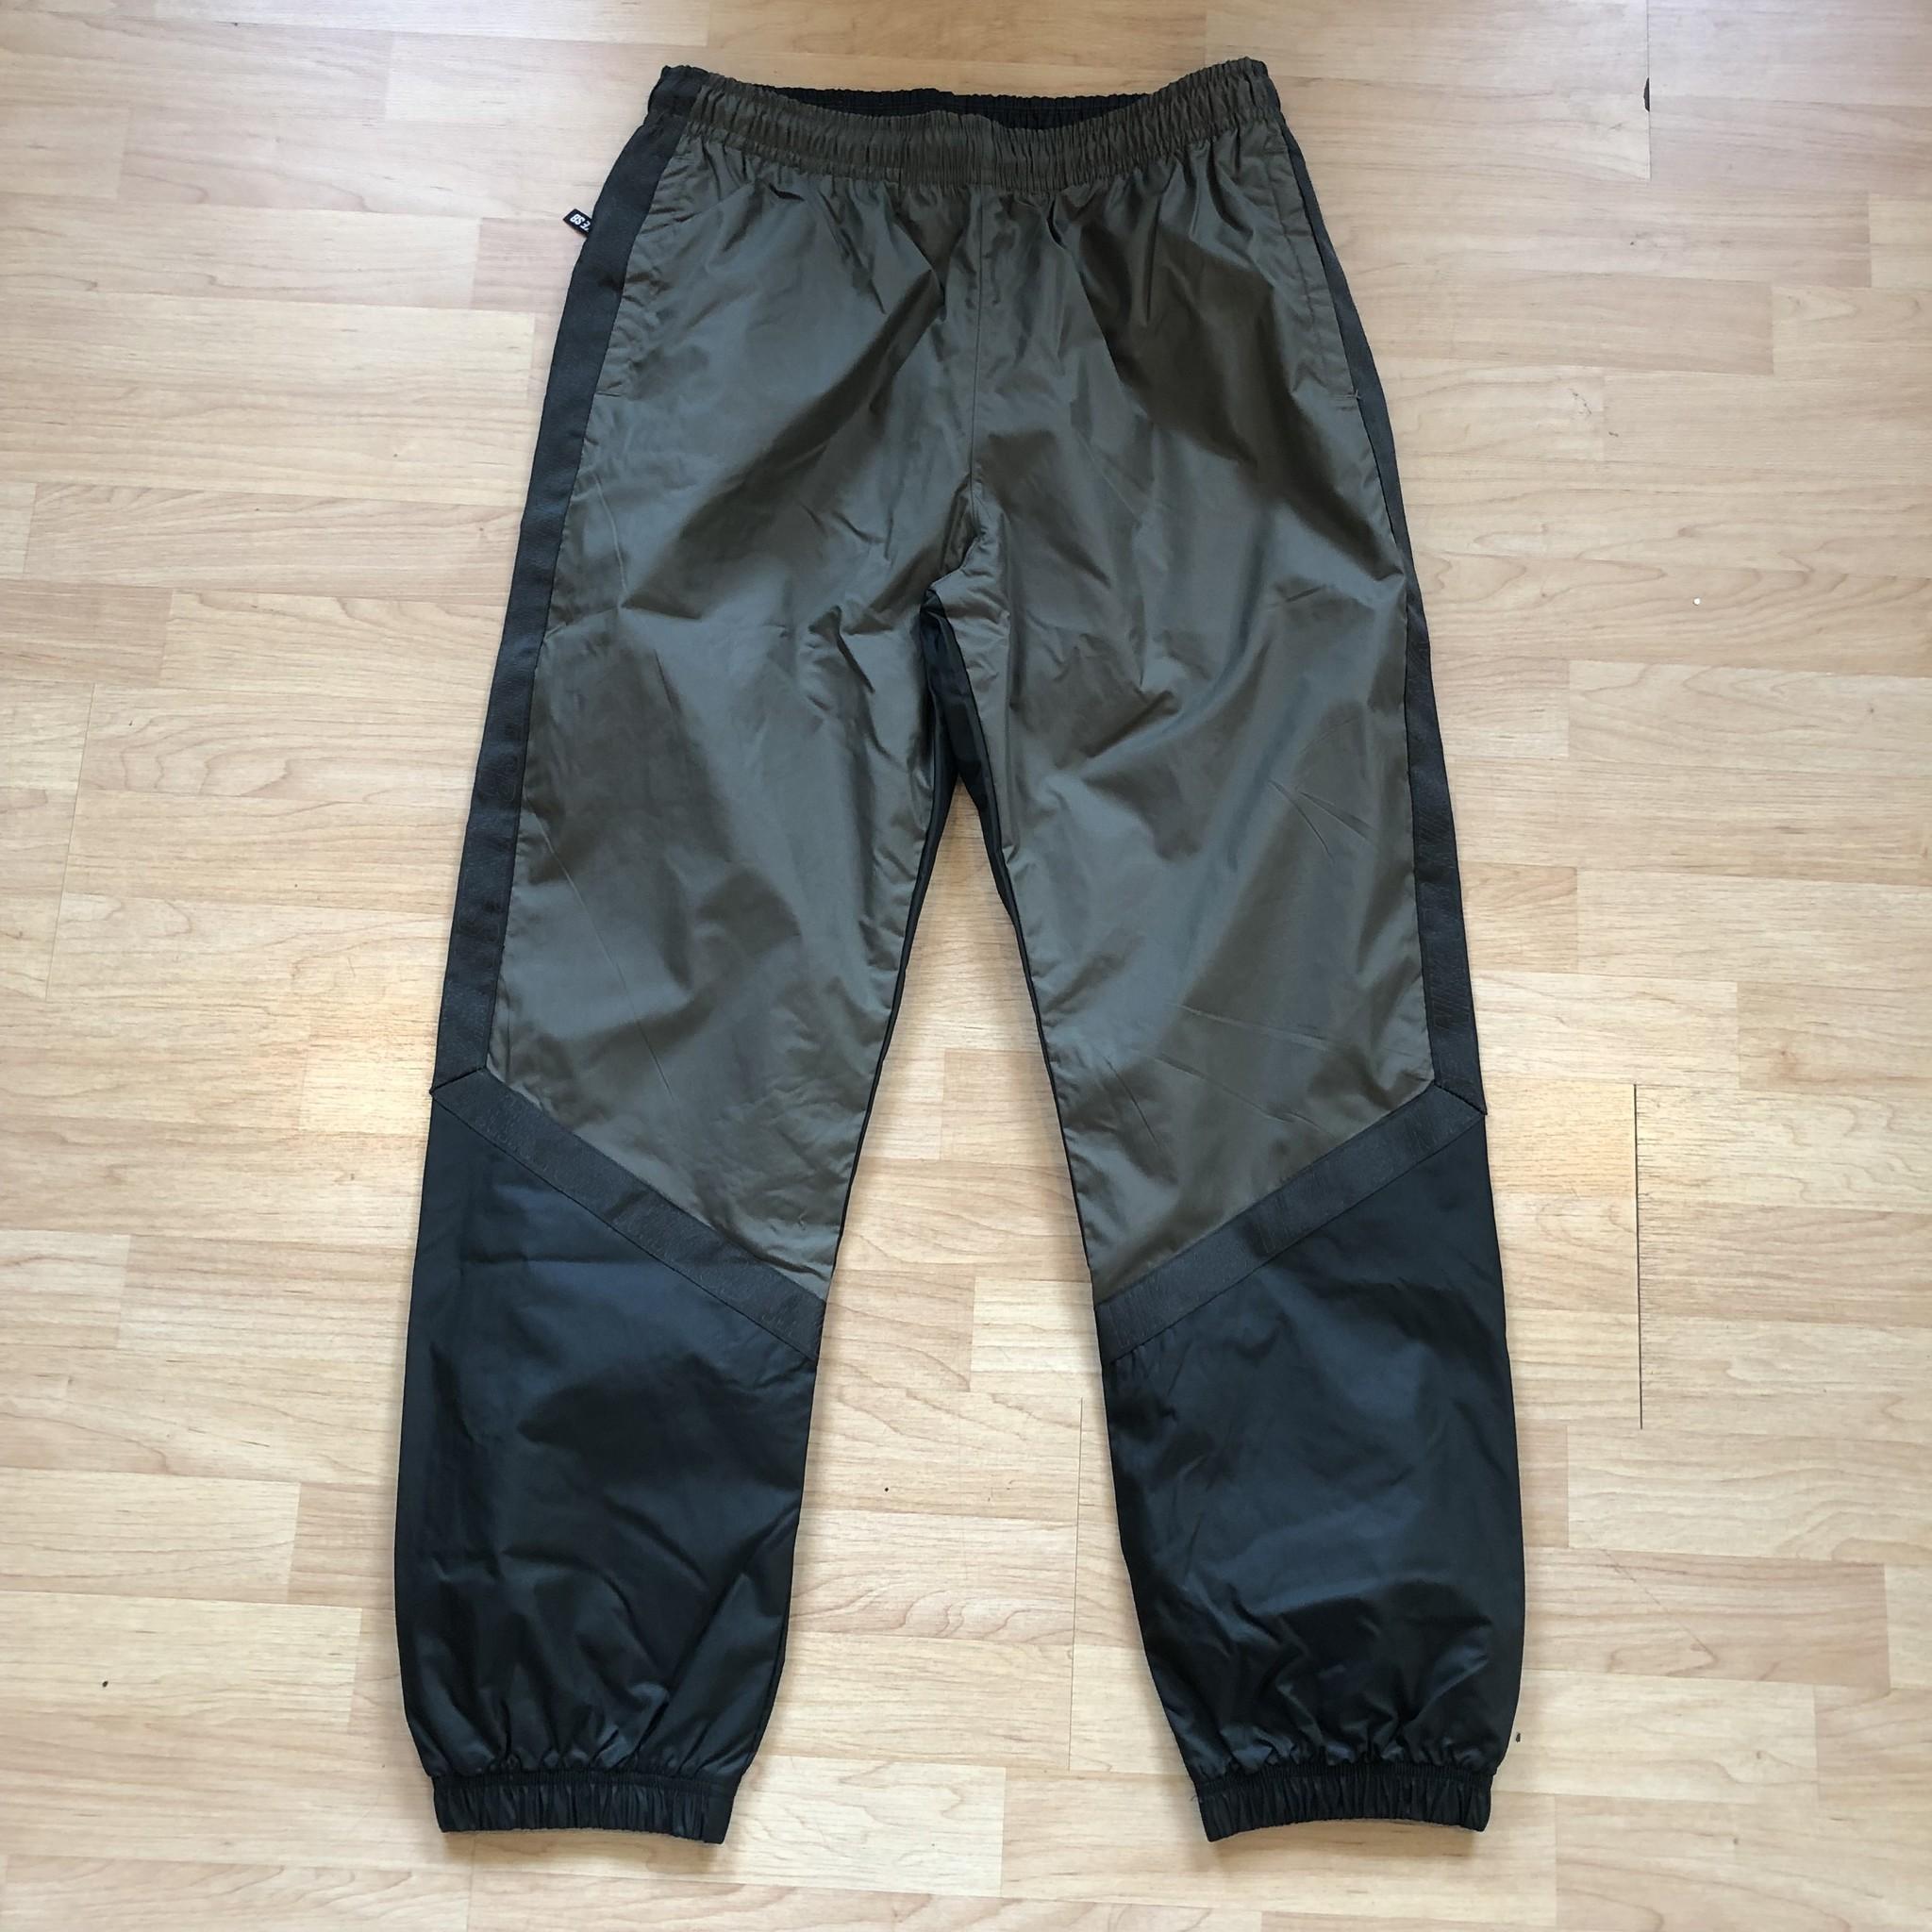 Nike USA, Inc. Nike SB Track Pant ISO Olive/Sequoia